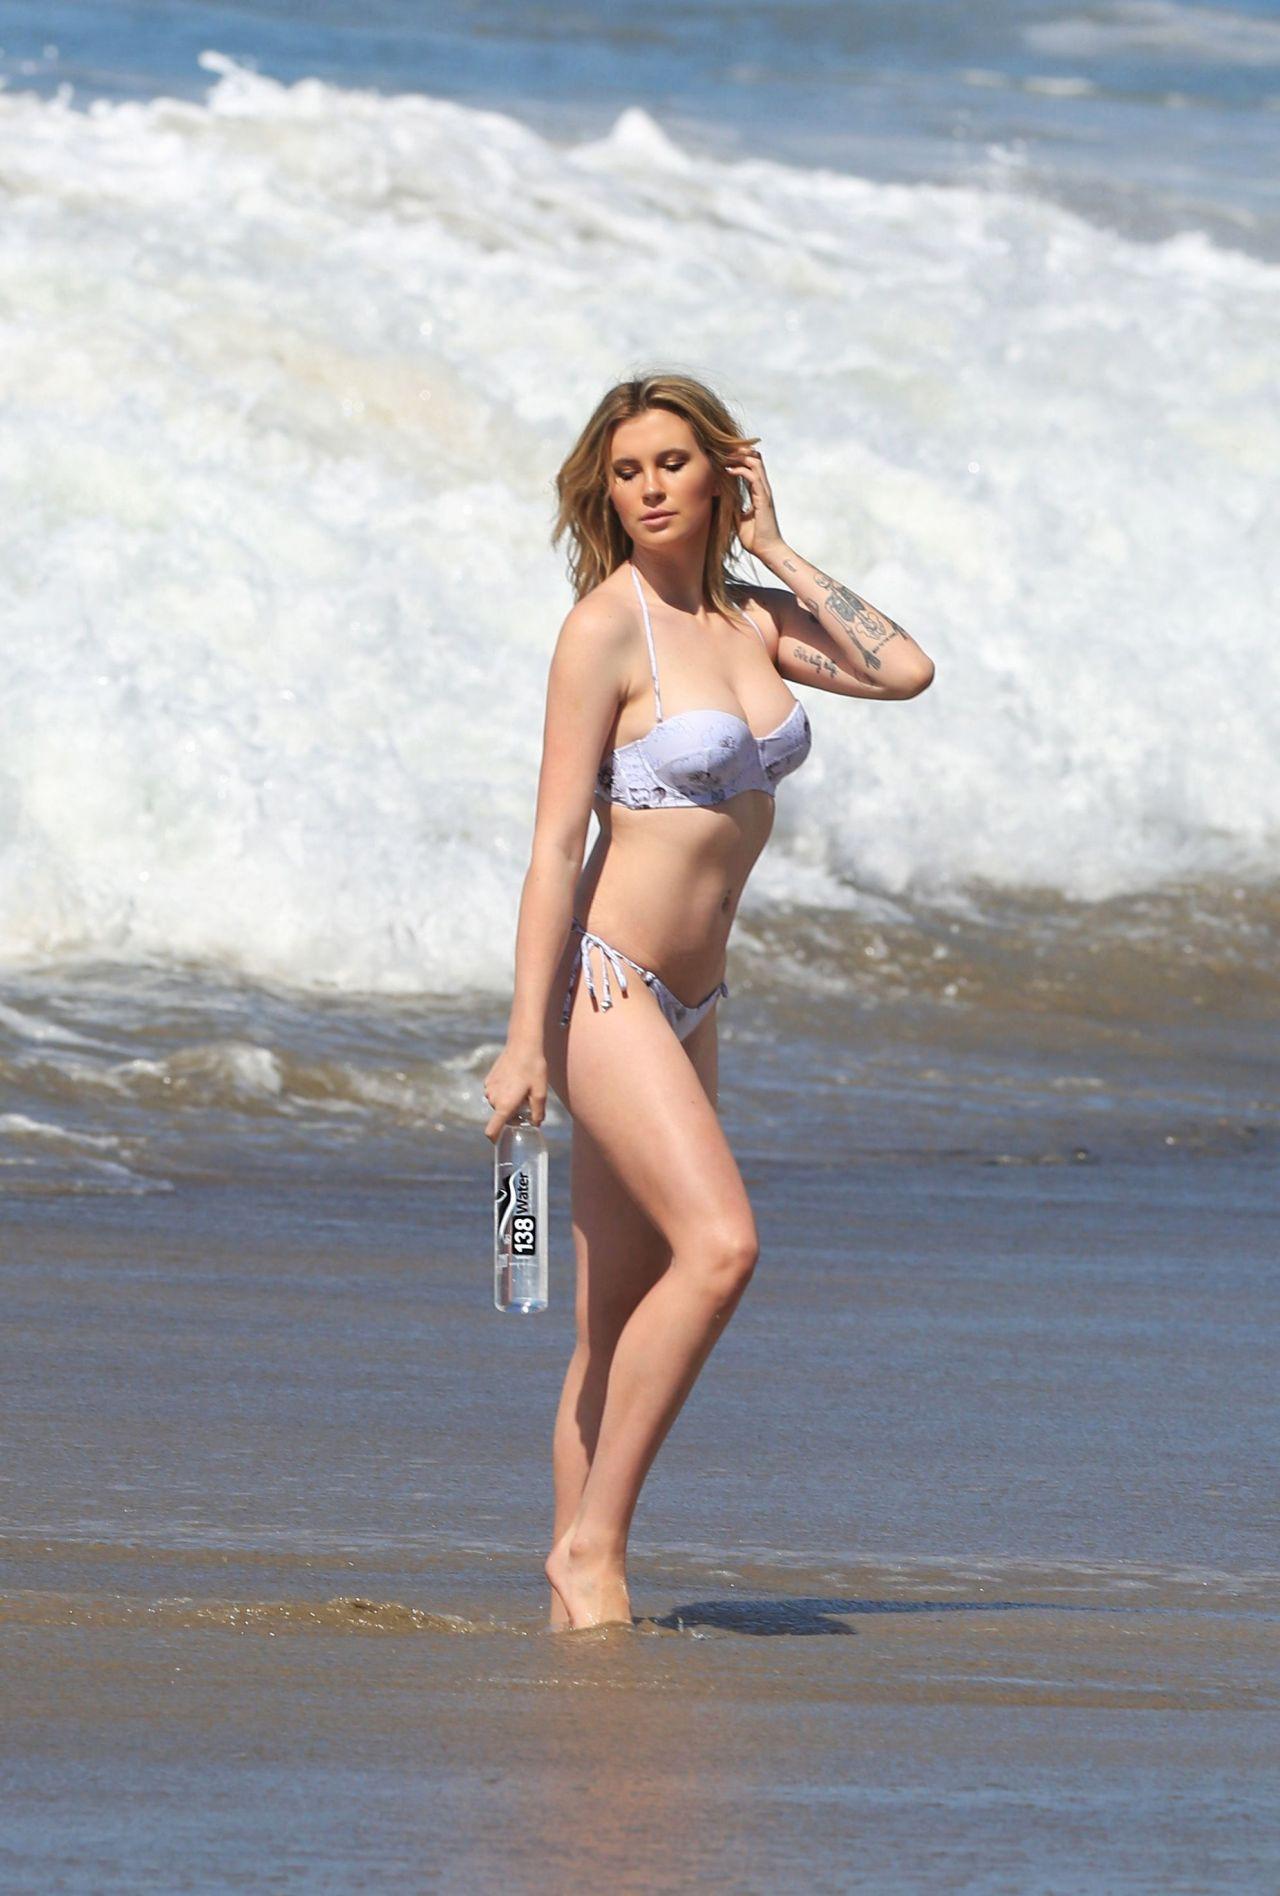 Ireland Baldwin Bikini Photoshoot For 138 Water Malibu 3